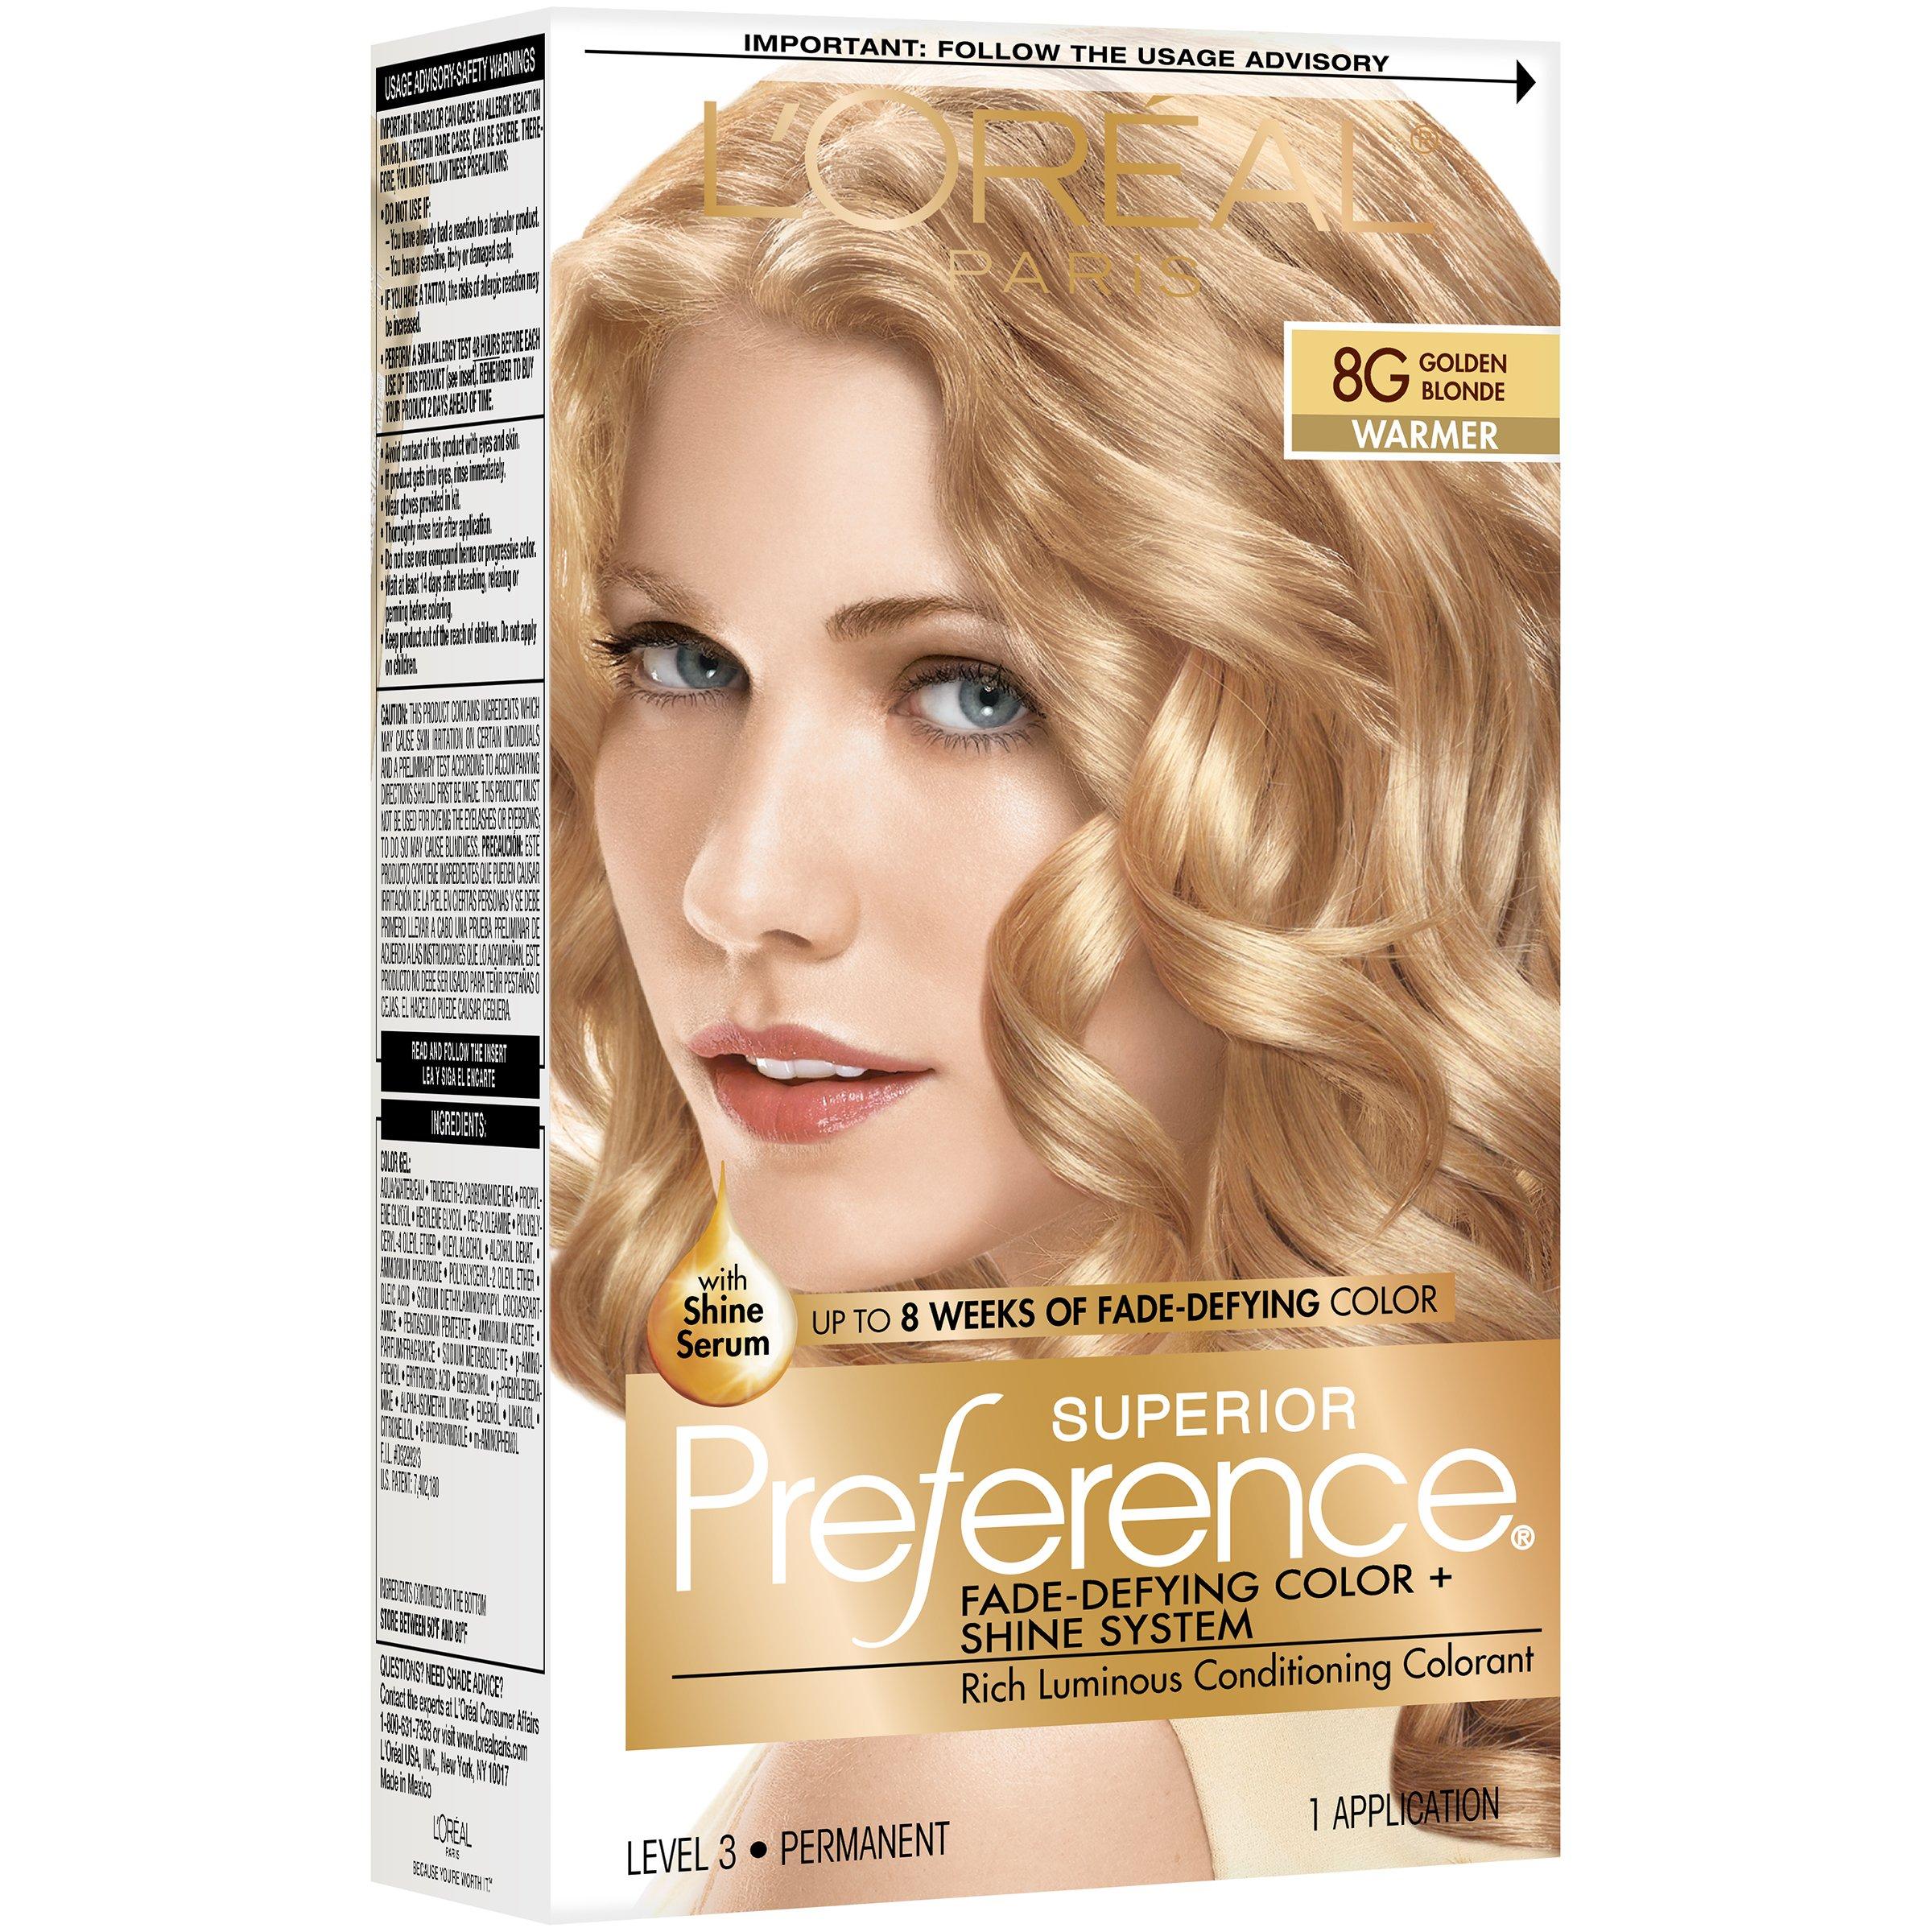 L Oreal Paris Superior Preference Permanent Hair Color 8g Golden Blonde Shop Hair Color At H E B